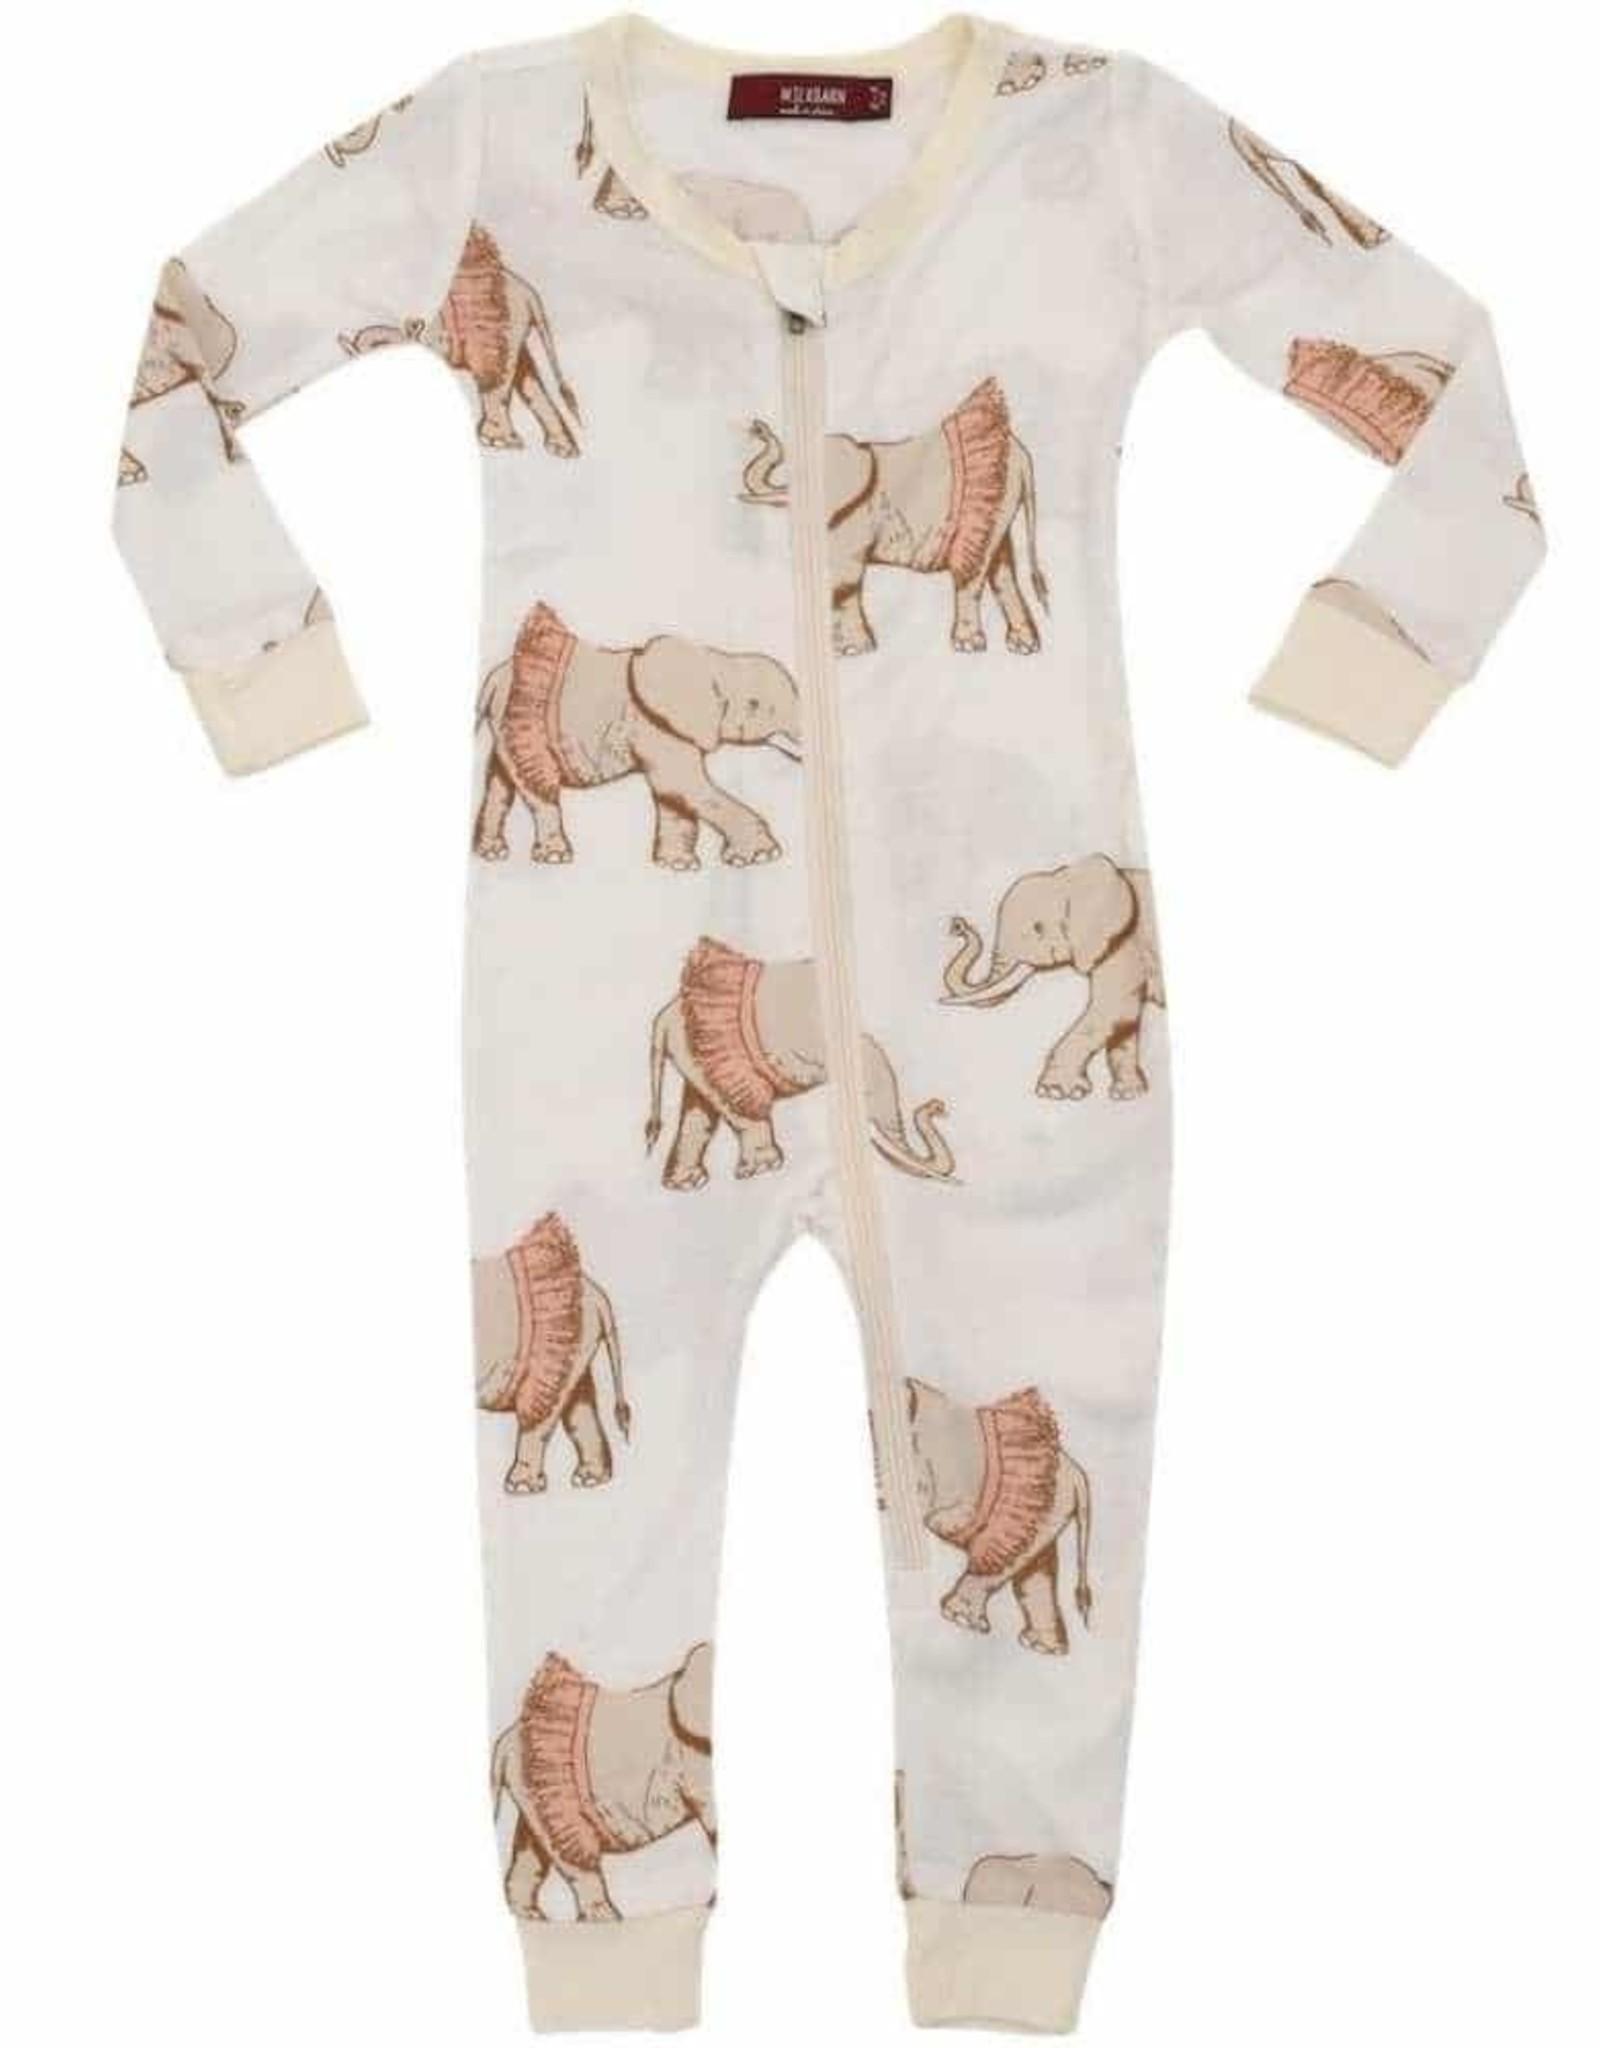 Milkbarn Millkbarn   Zipper Pajamas